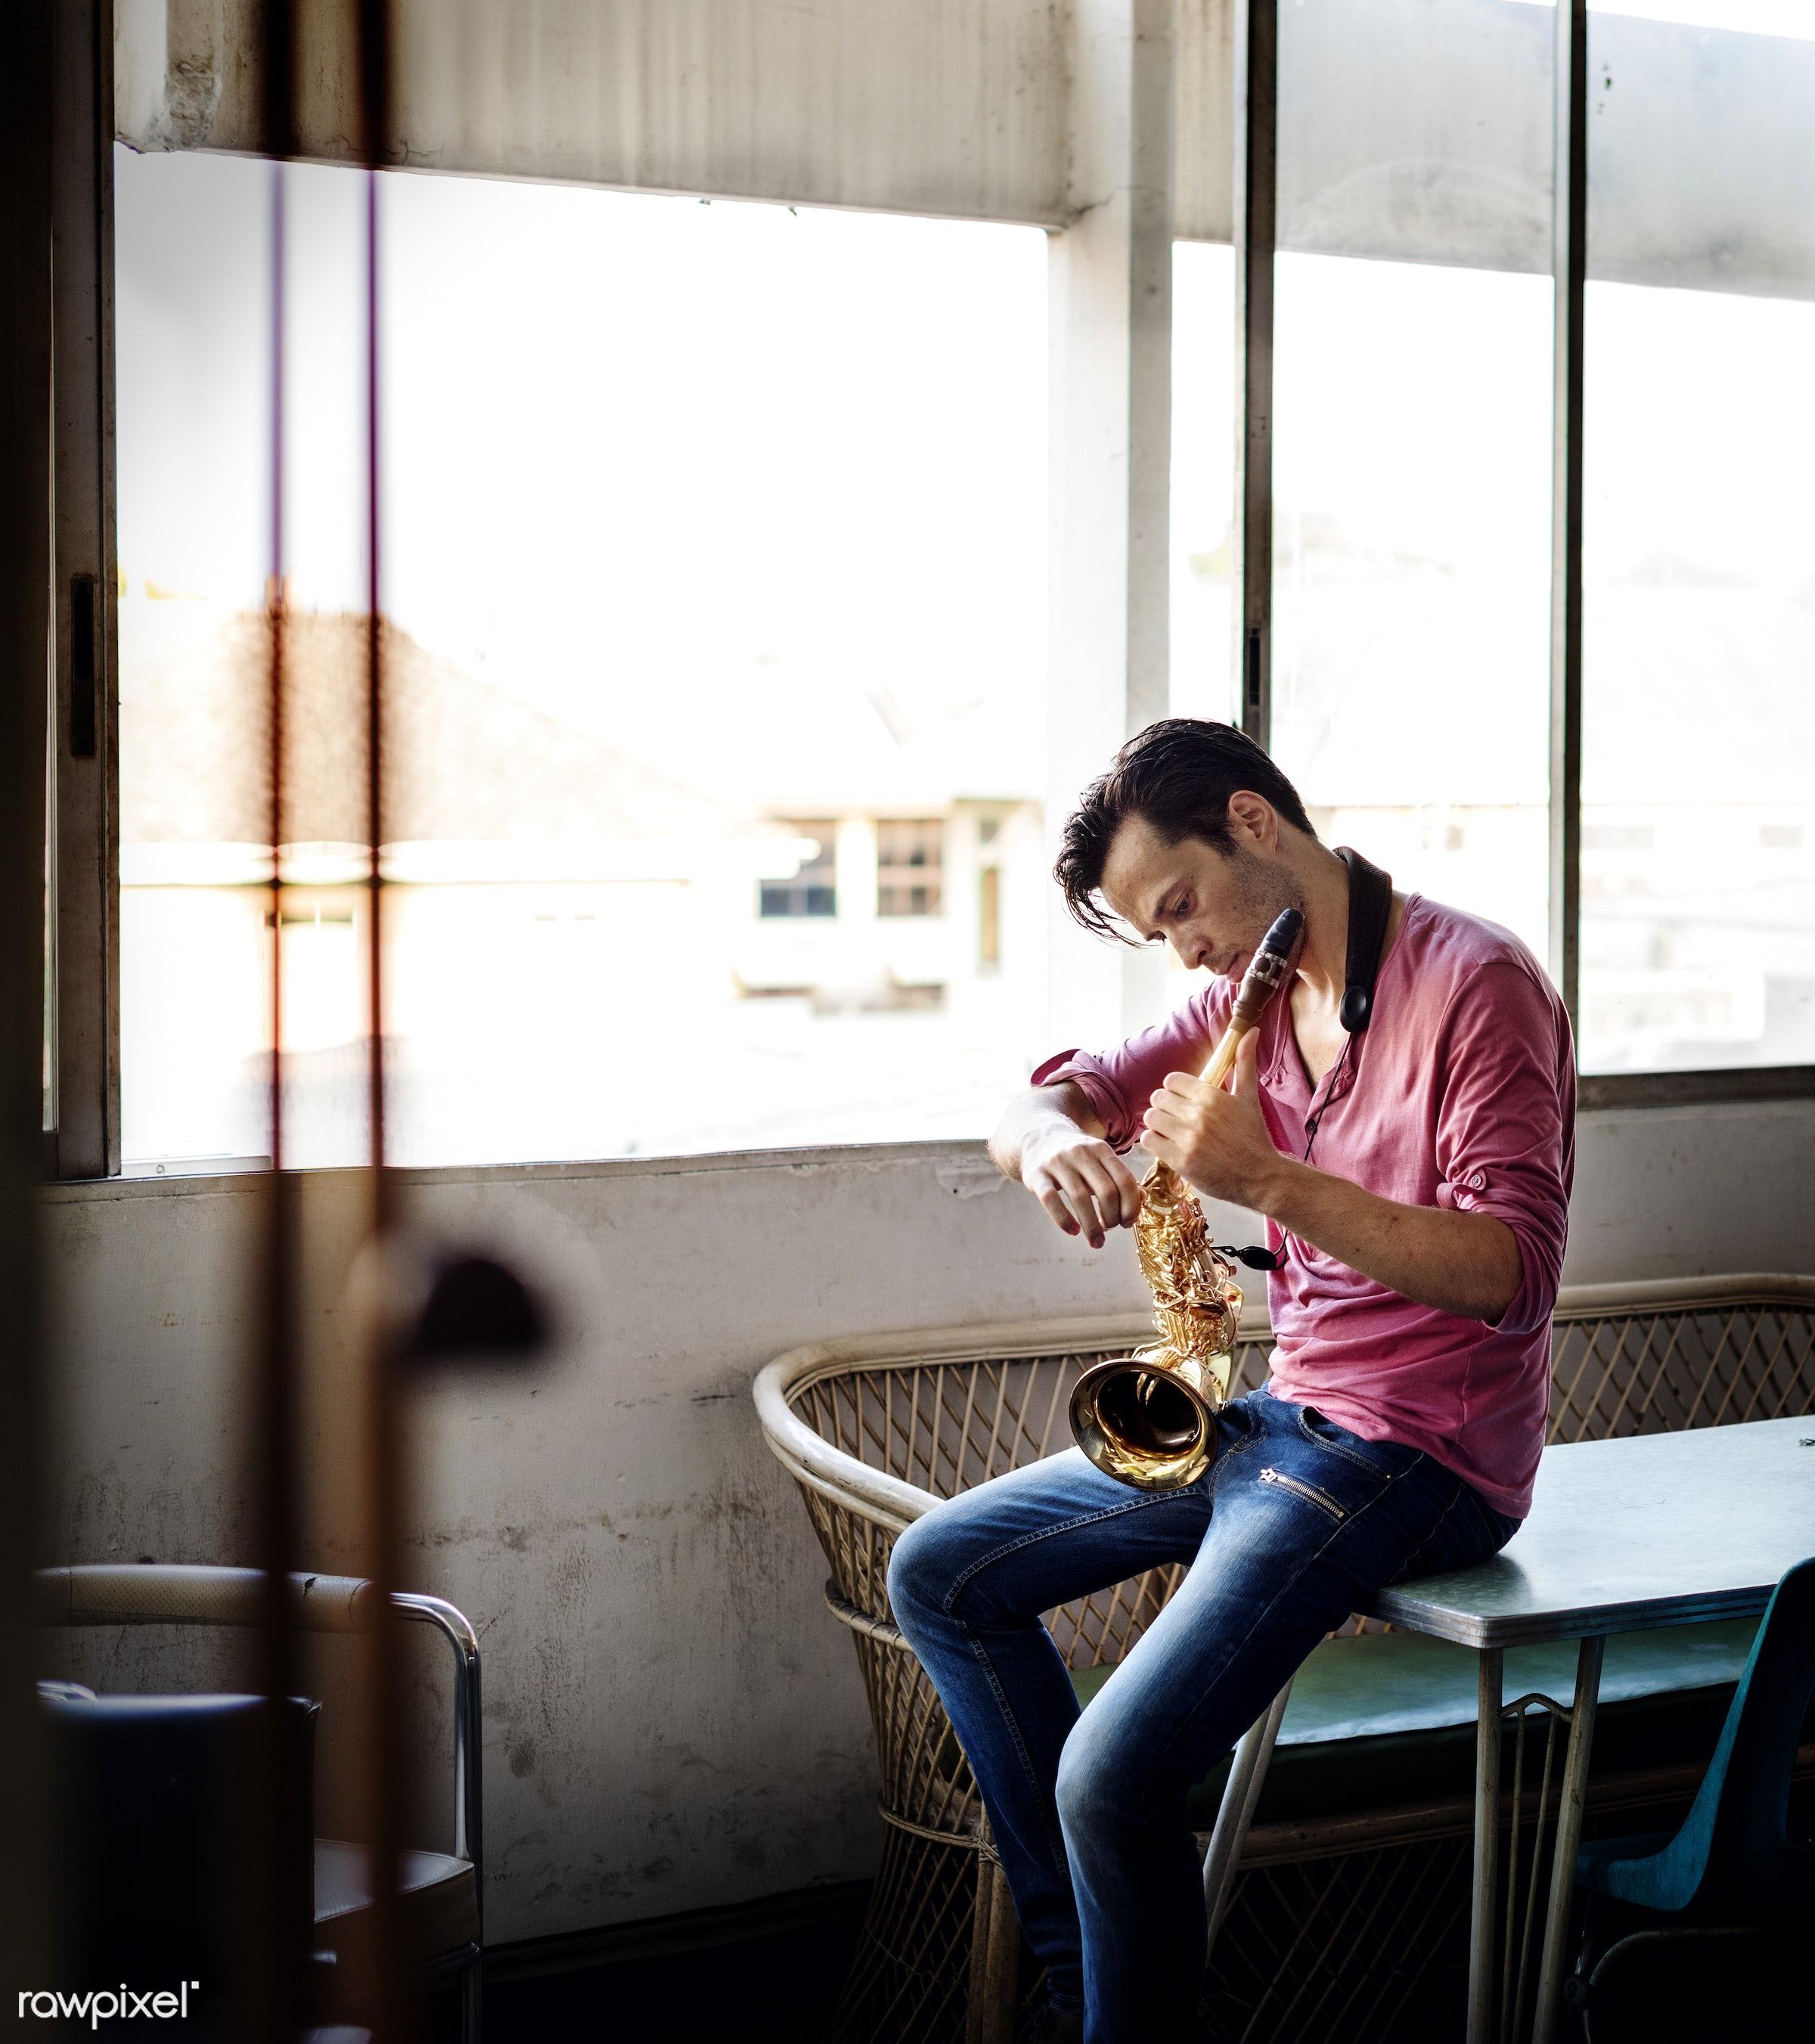 rehearsal, playing, saxophone, performance, musician, tuning, alone, man, music, saxophonist, jazz, hobby, leisure,...